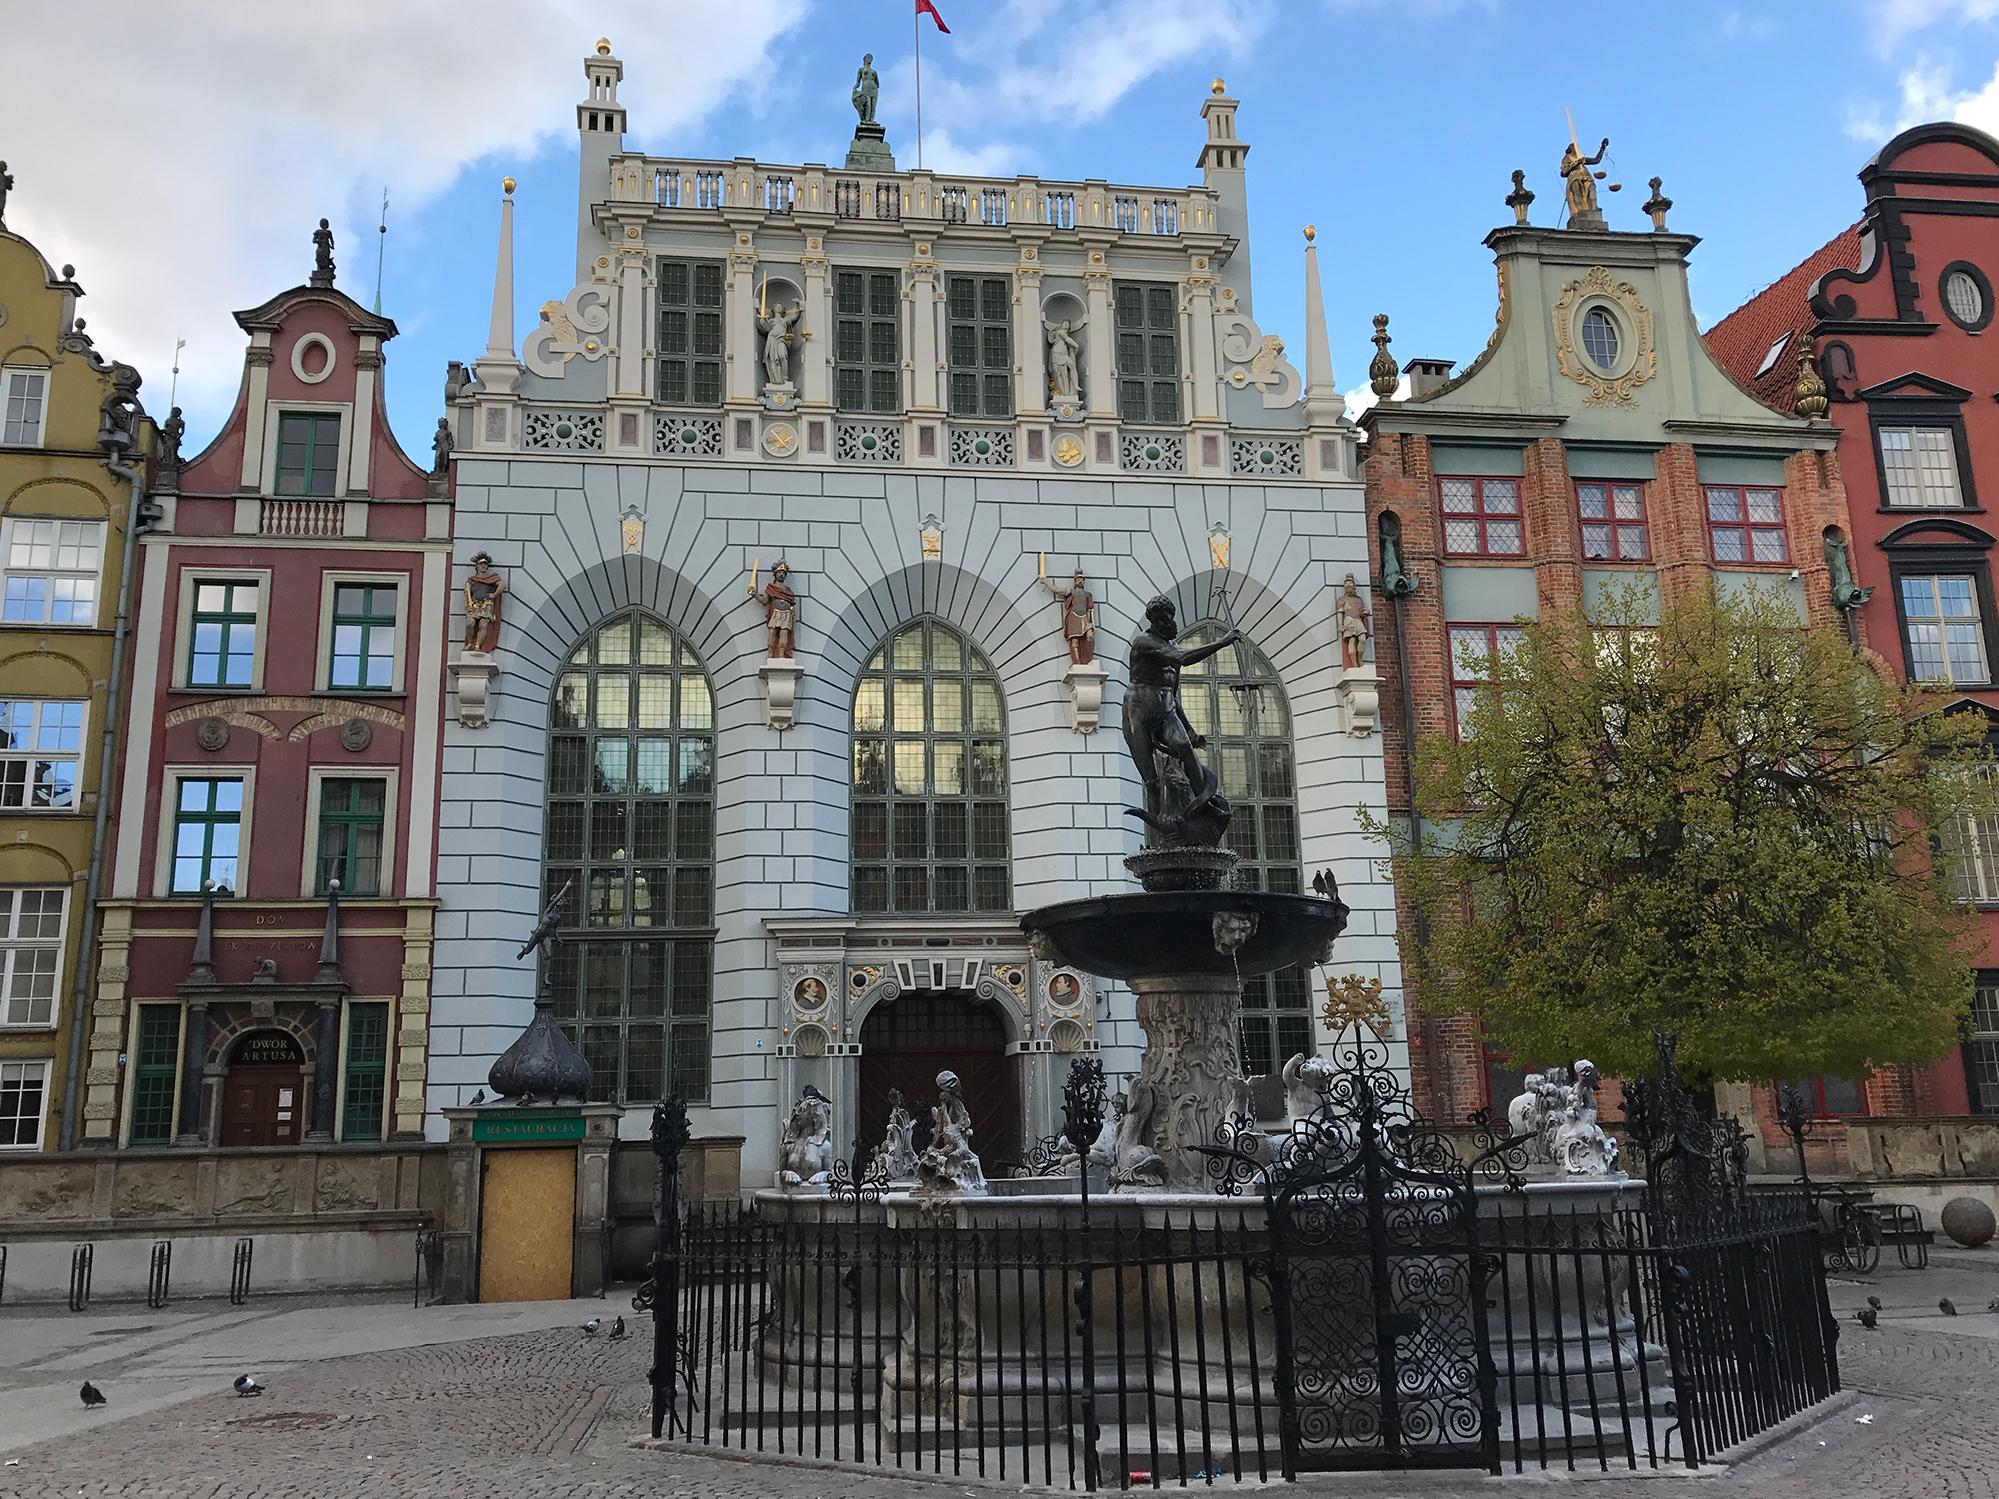 Fontanna Neptuna (The Fountain of Neptune) and Dwór Artusa (The Artus Court), Długi Targ, Gdańsk